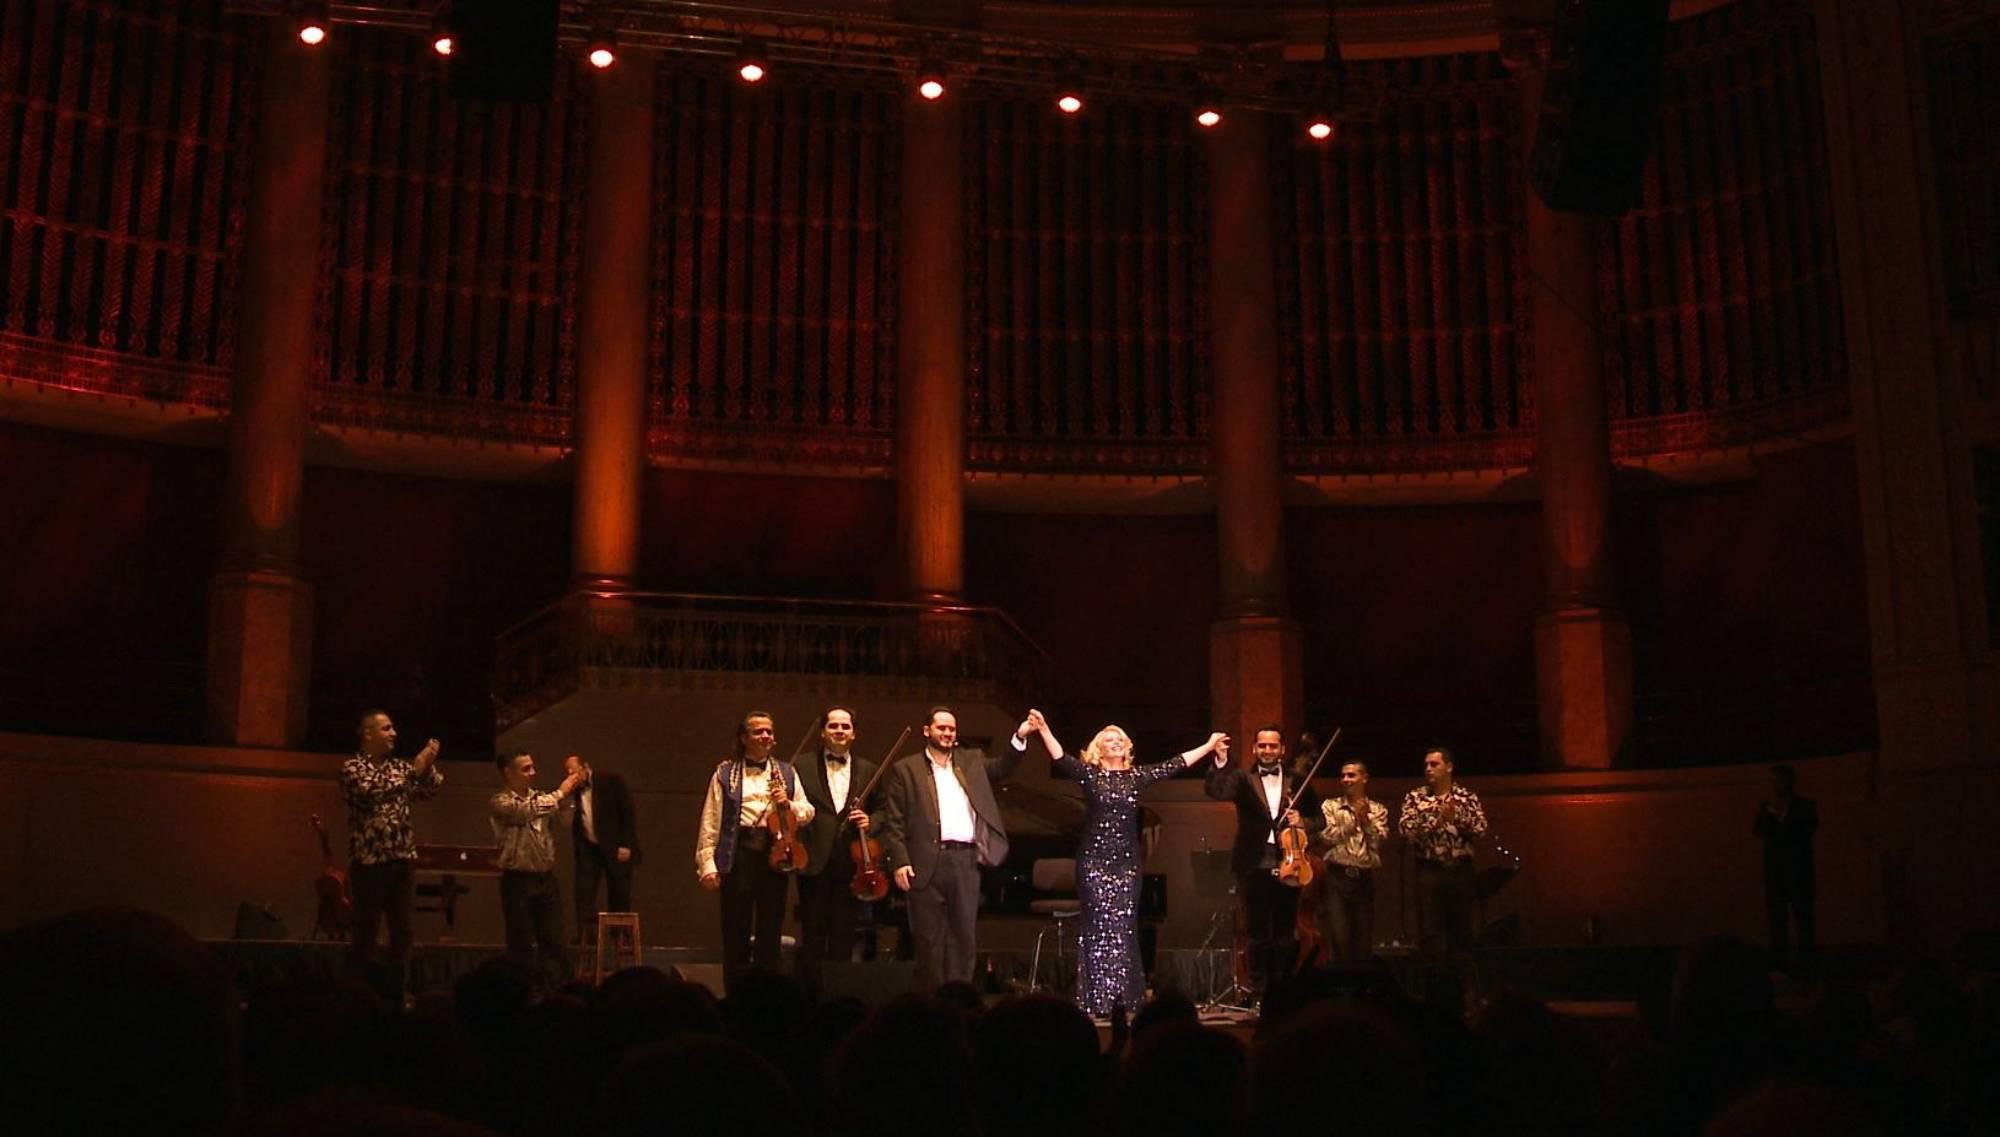 Silvestergala 2017/18, Janoska Ensemble, Wiener Konzerthaus, Regie: Nicole Claudia Weber, Foto: Florian Petermann